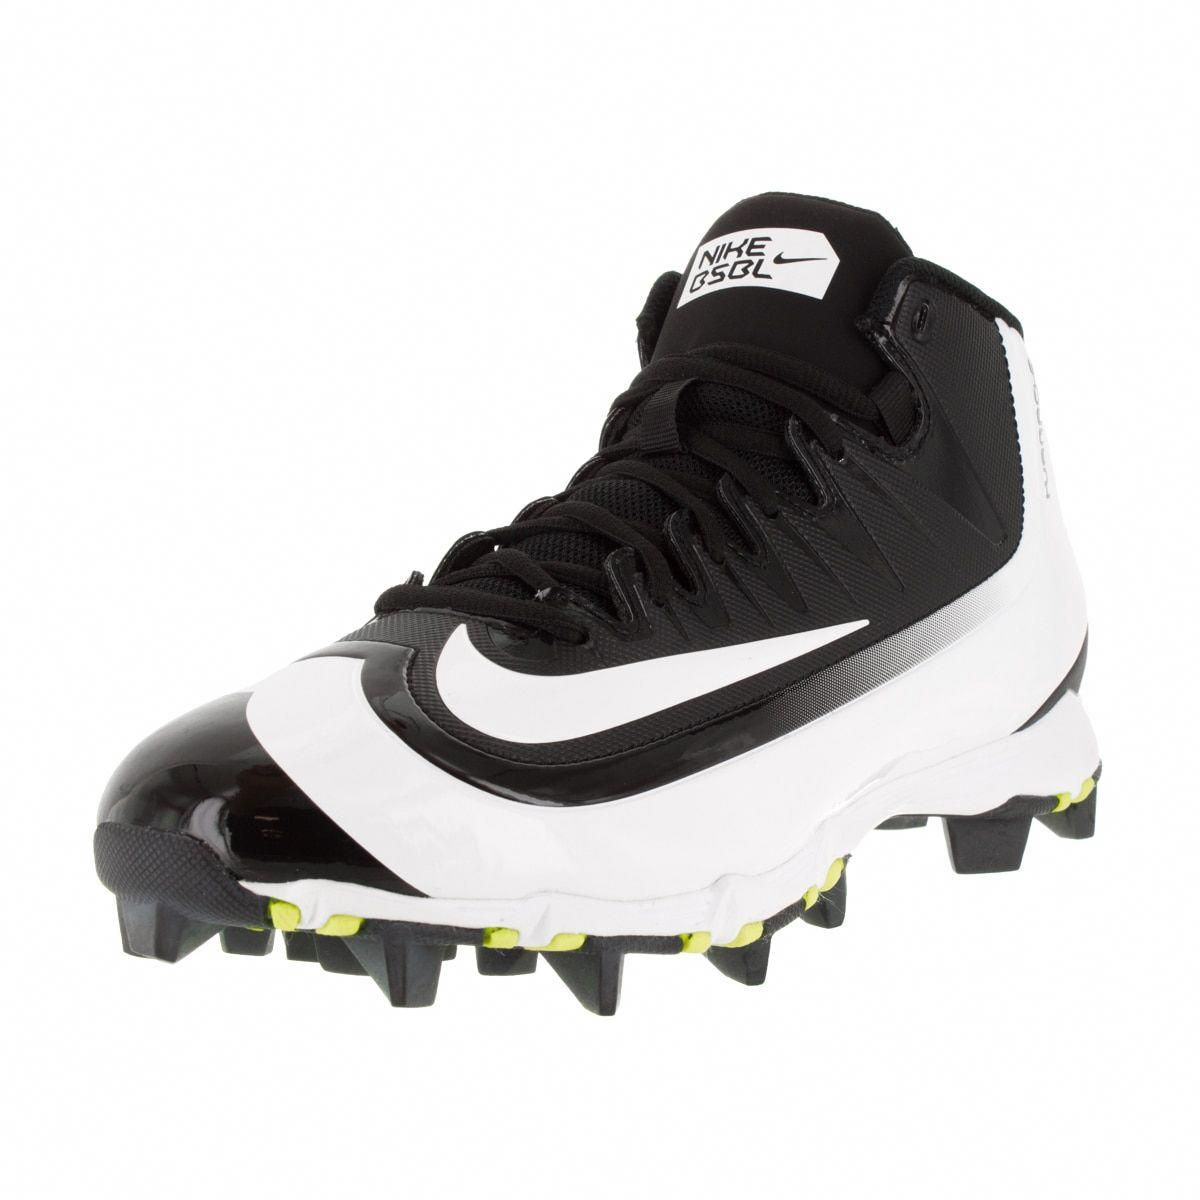 a48c8120b5bf NIKE Mens Huarache 2KFilth Keystone Mid Baseball Cleat Nike Huarache 2K  Filth Keystone Footwear